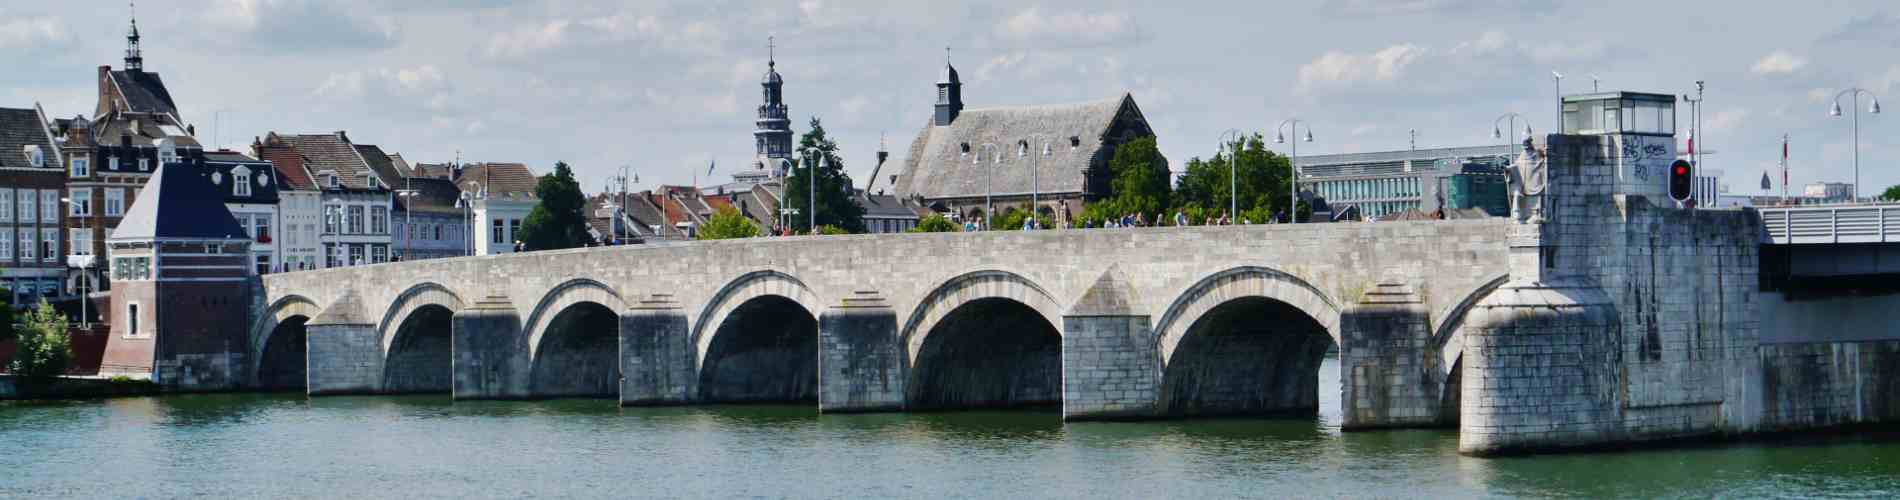 city-kamp-Sint-Servaasbrug-Maastricht-1900x500